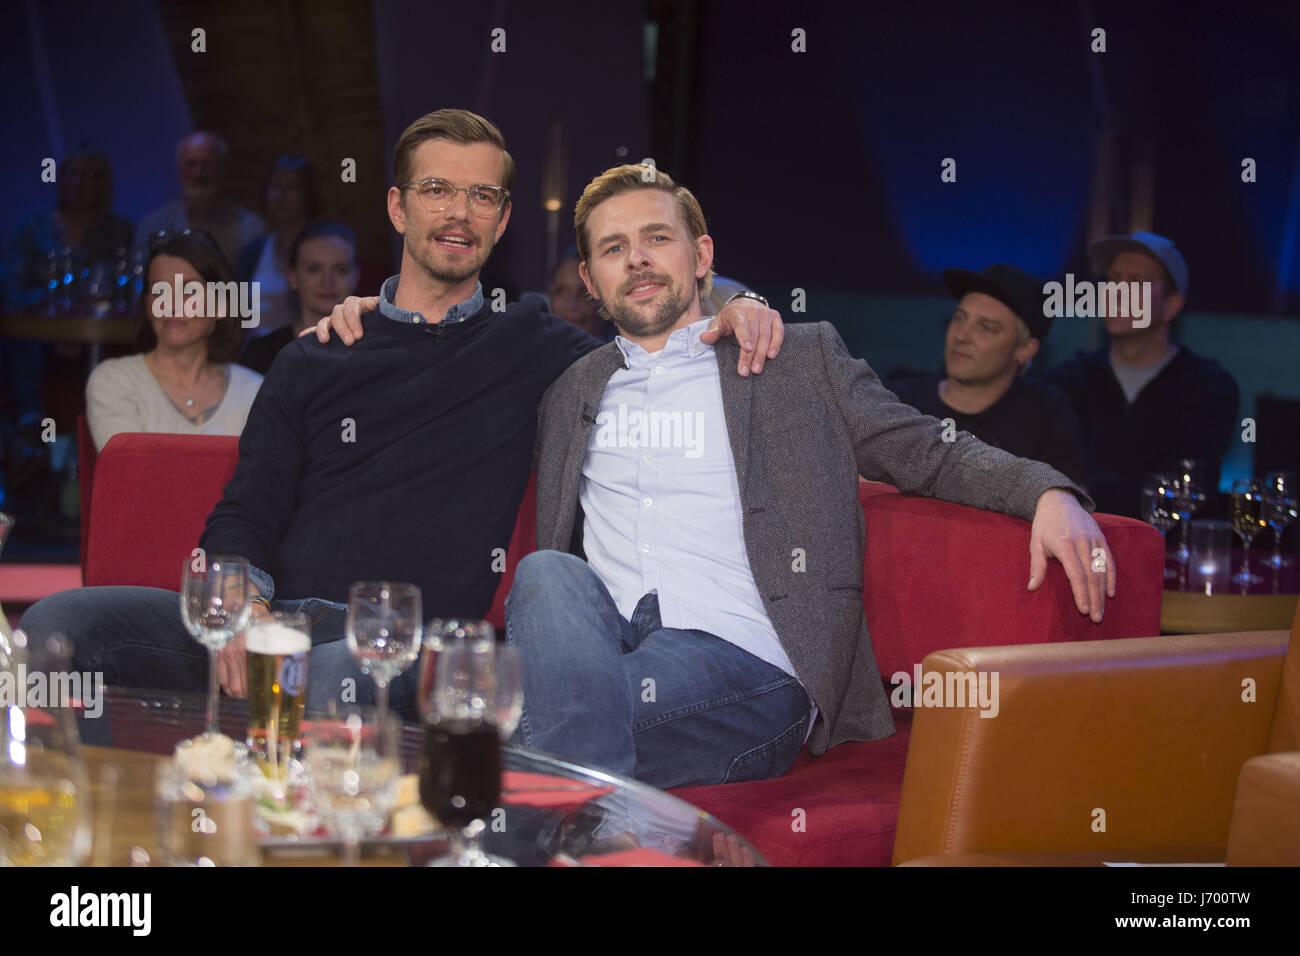 Deutsche ndr tv talkshow ndr talkshow im ndr studio mit joko winterscheidt klaas heufer umlauf Moderatoren ndr talkshow